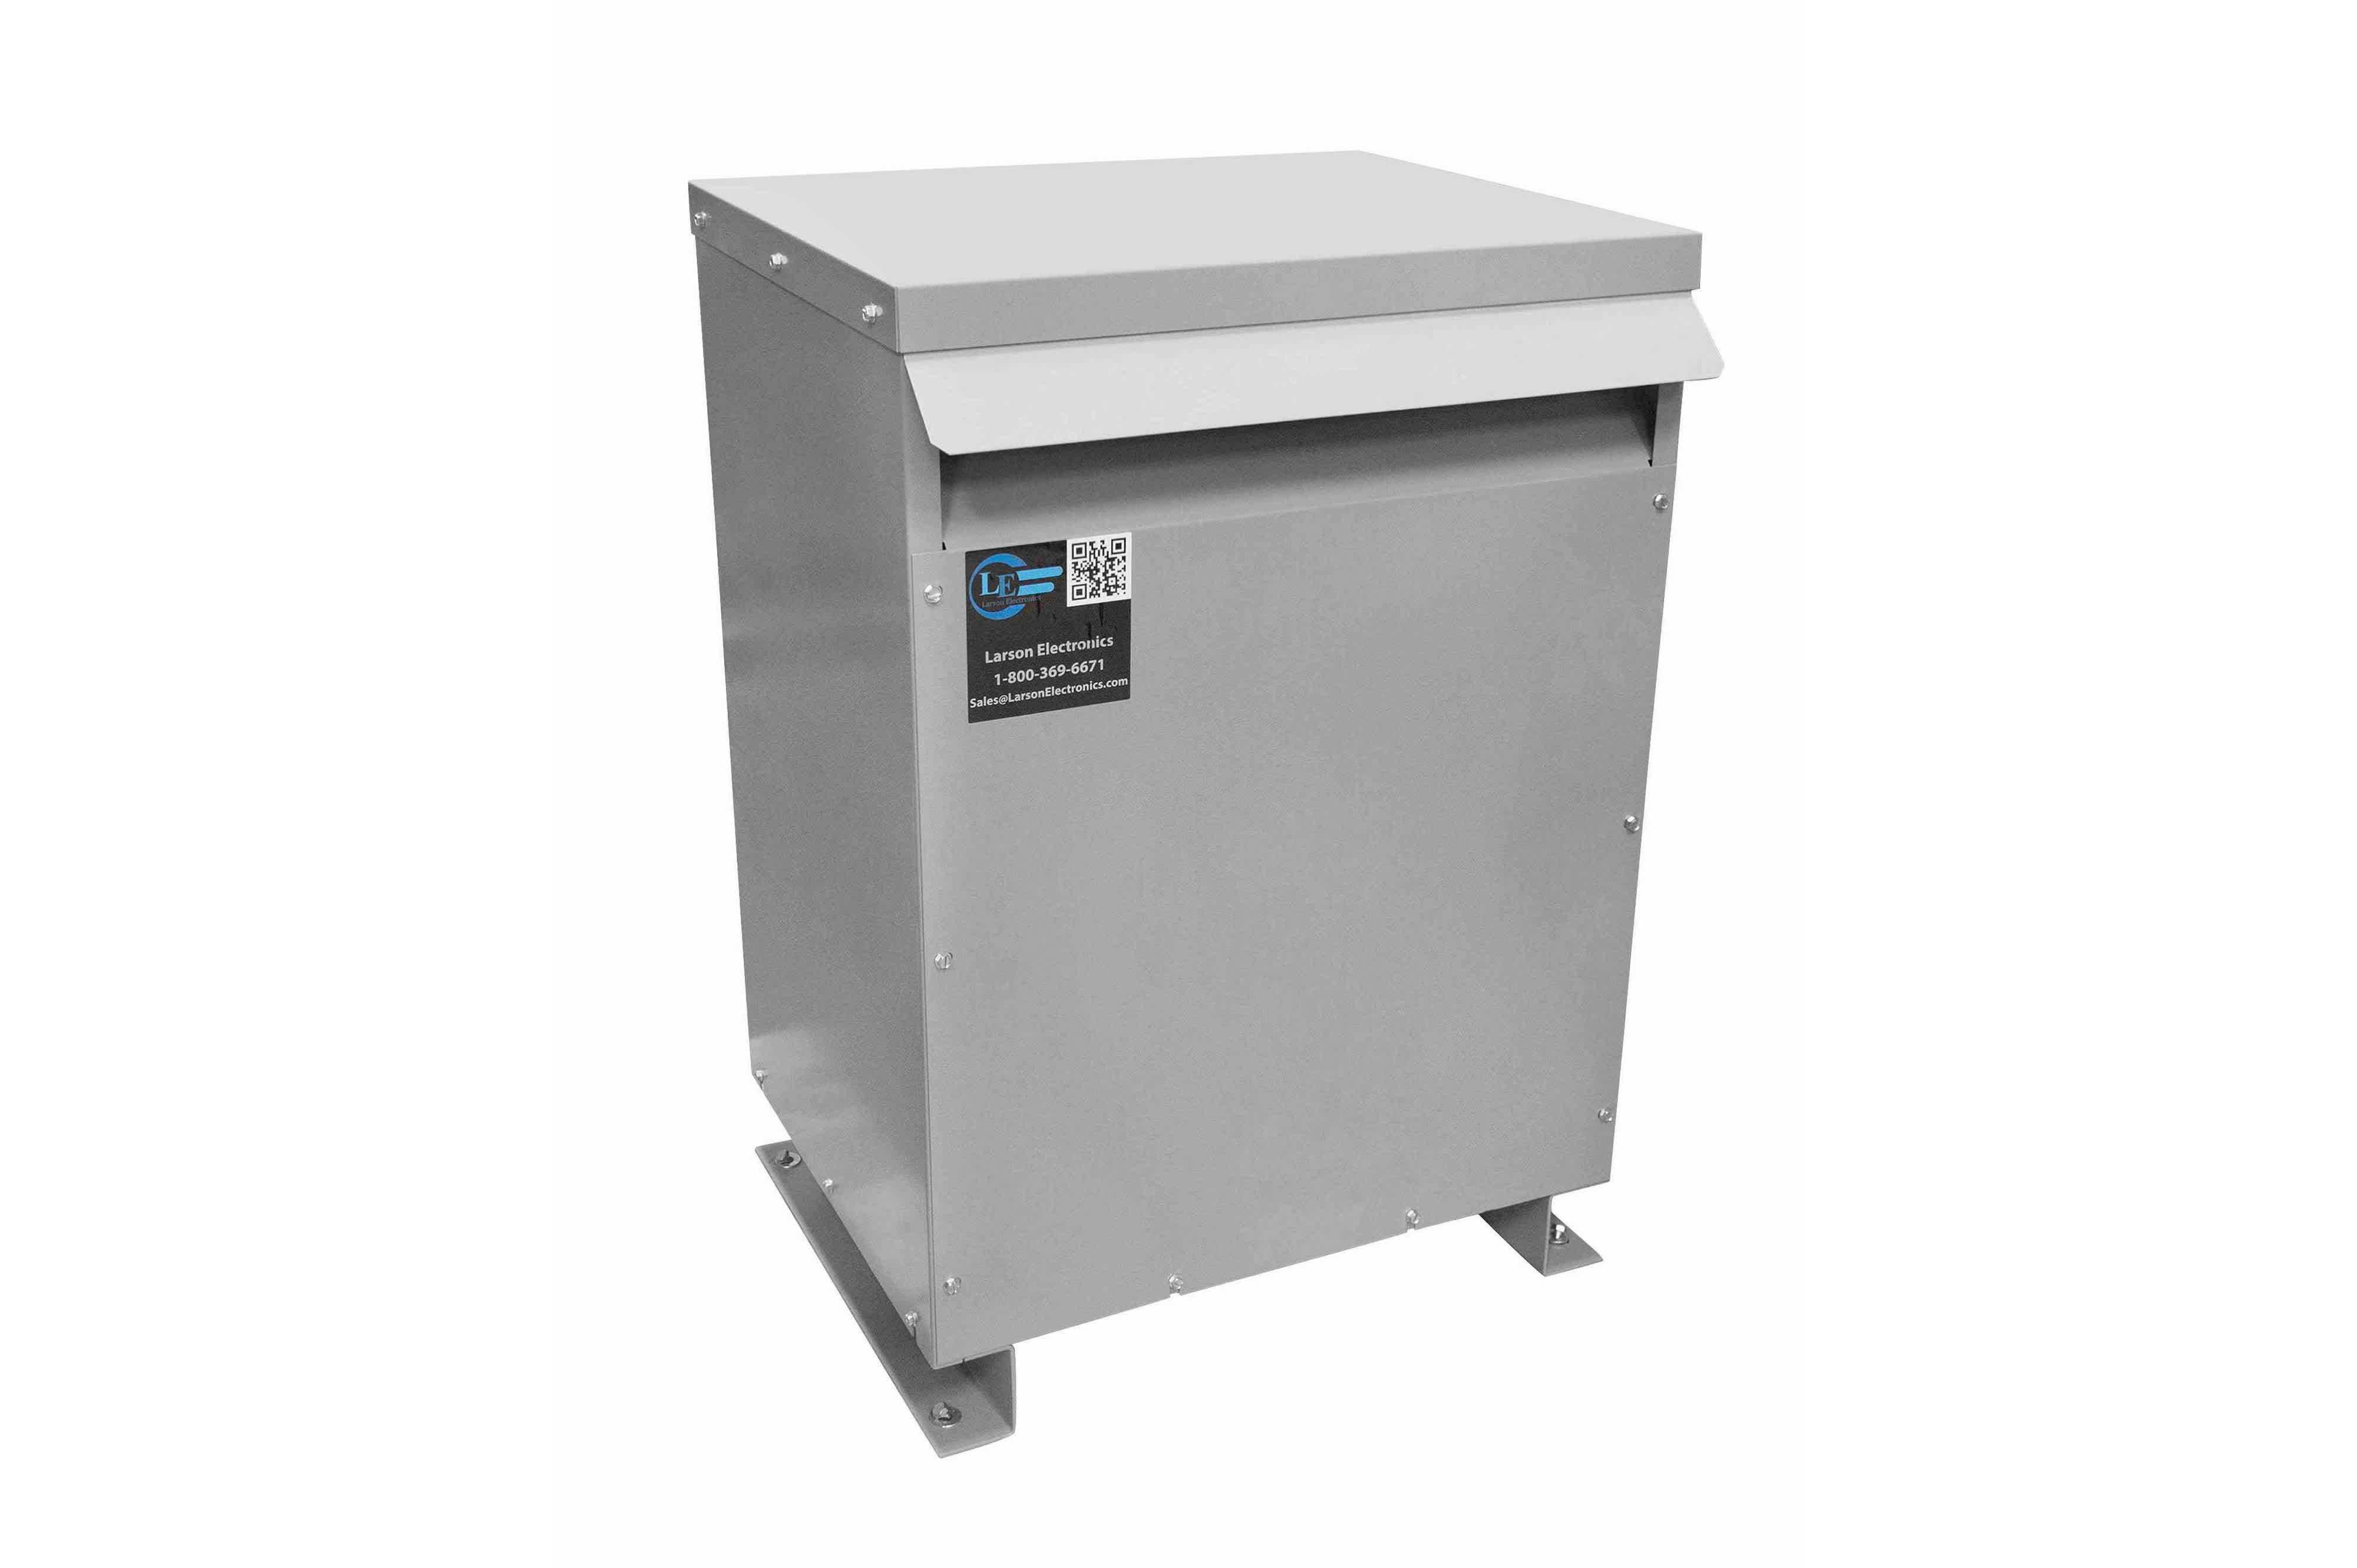 112.5 kVA 3PH DOE Transformer, 400V Delta Primary, 480Y/277 Wye-N Secondary, N3R, Ventilated, 60 Hz